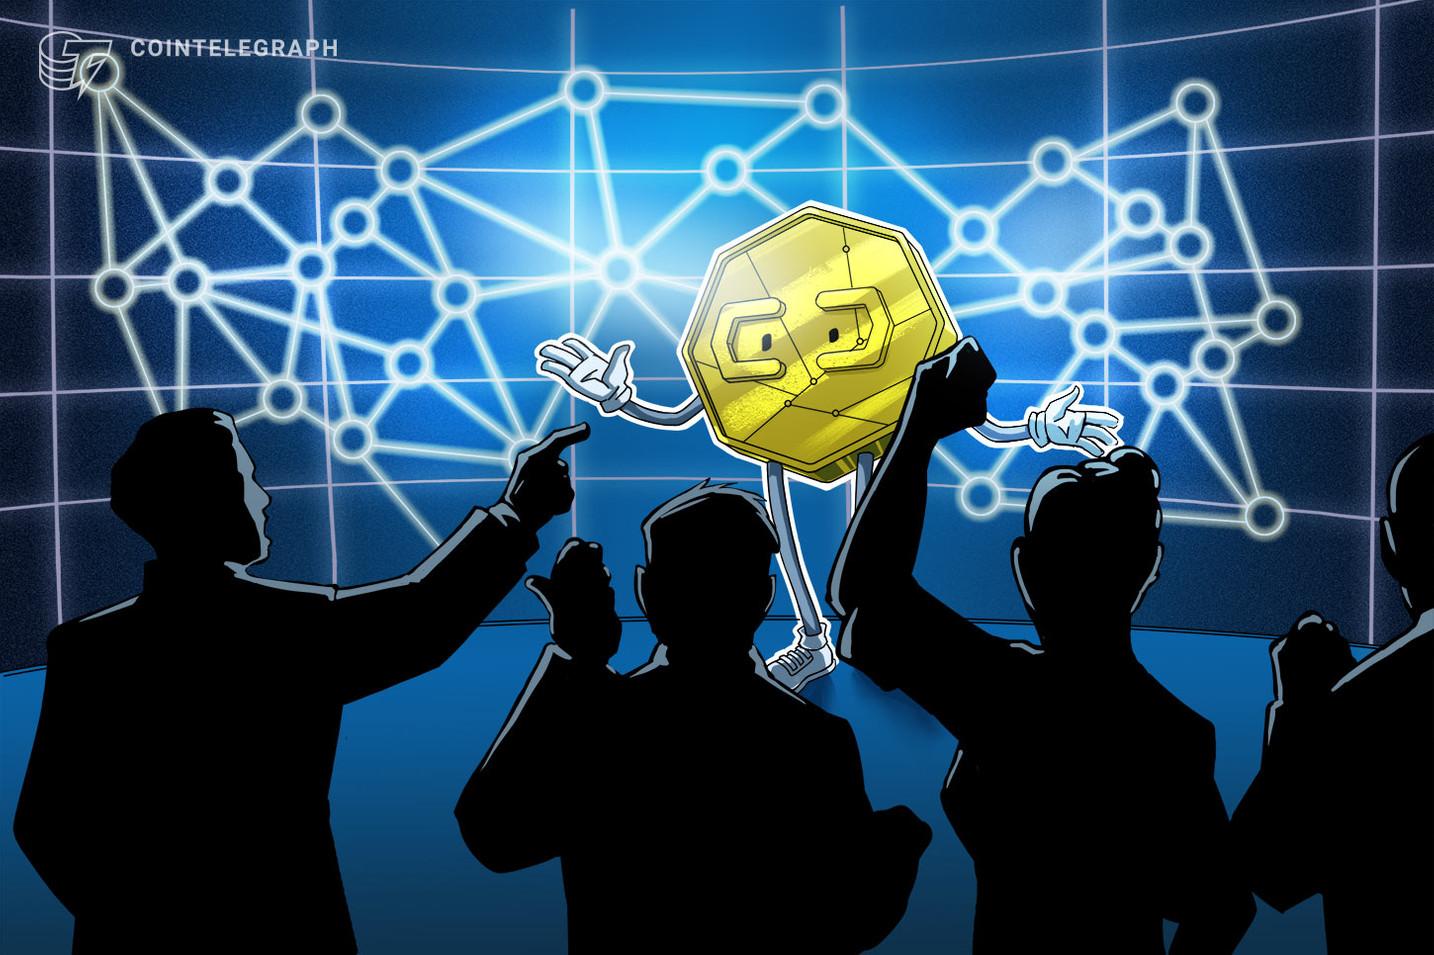 Geneva Management Group bietet jetzt weltweit Beratung zu Kryptowährungen an